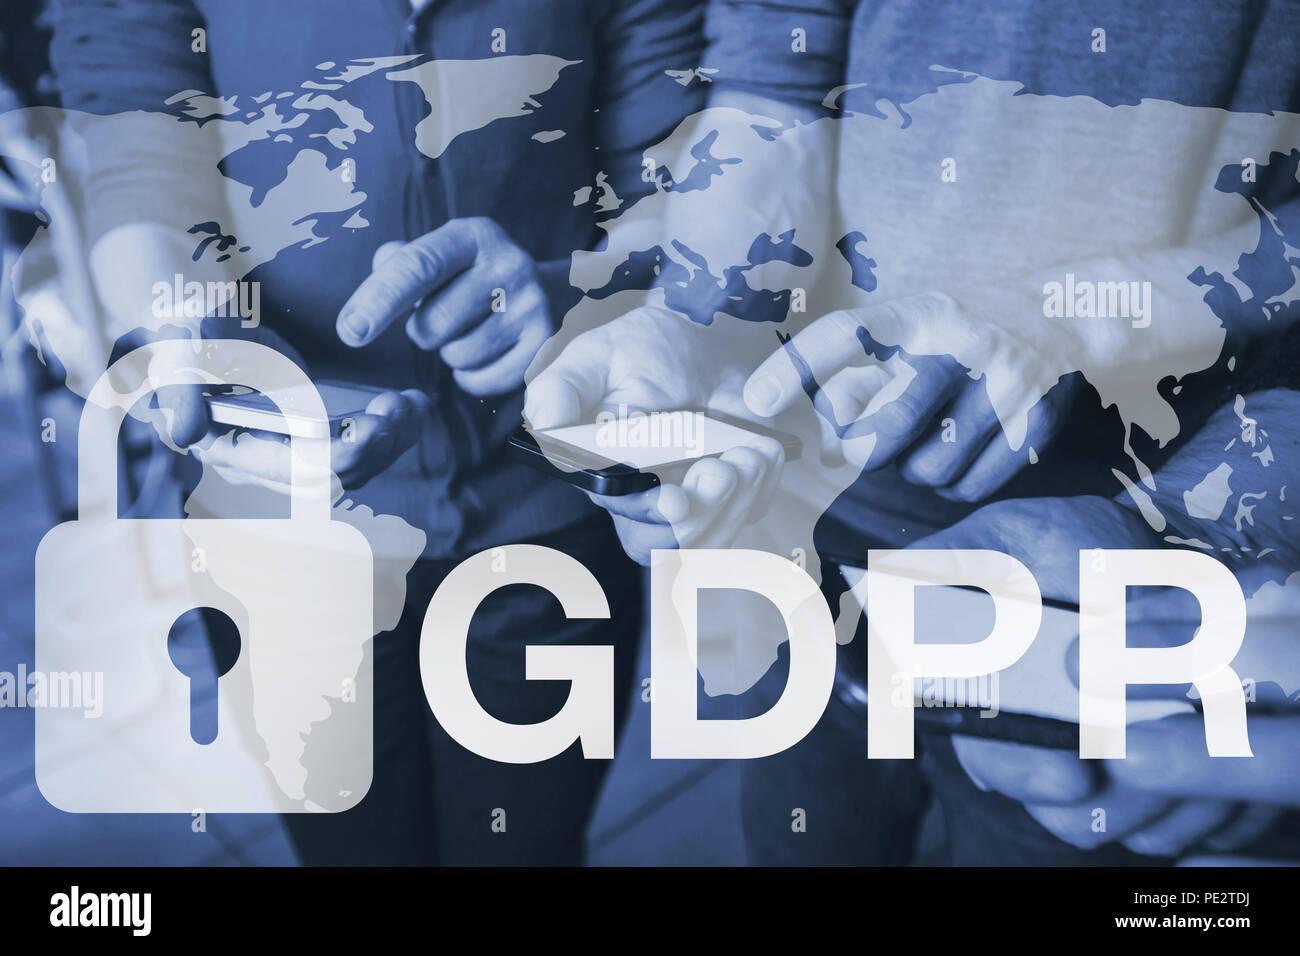 GDPR concept, general data protection regulation - Stock Image